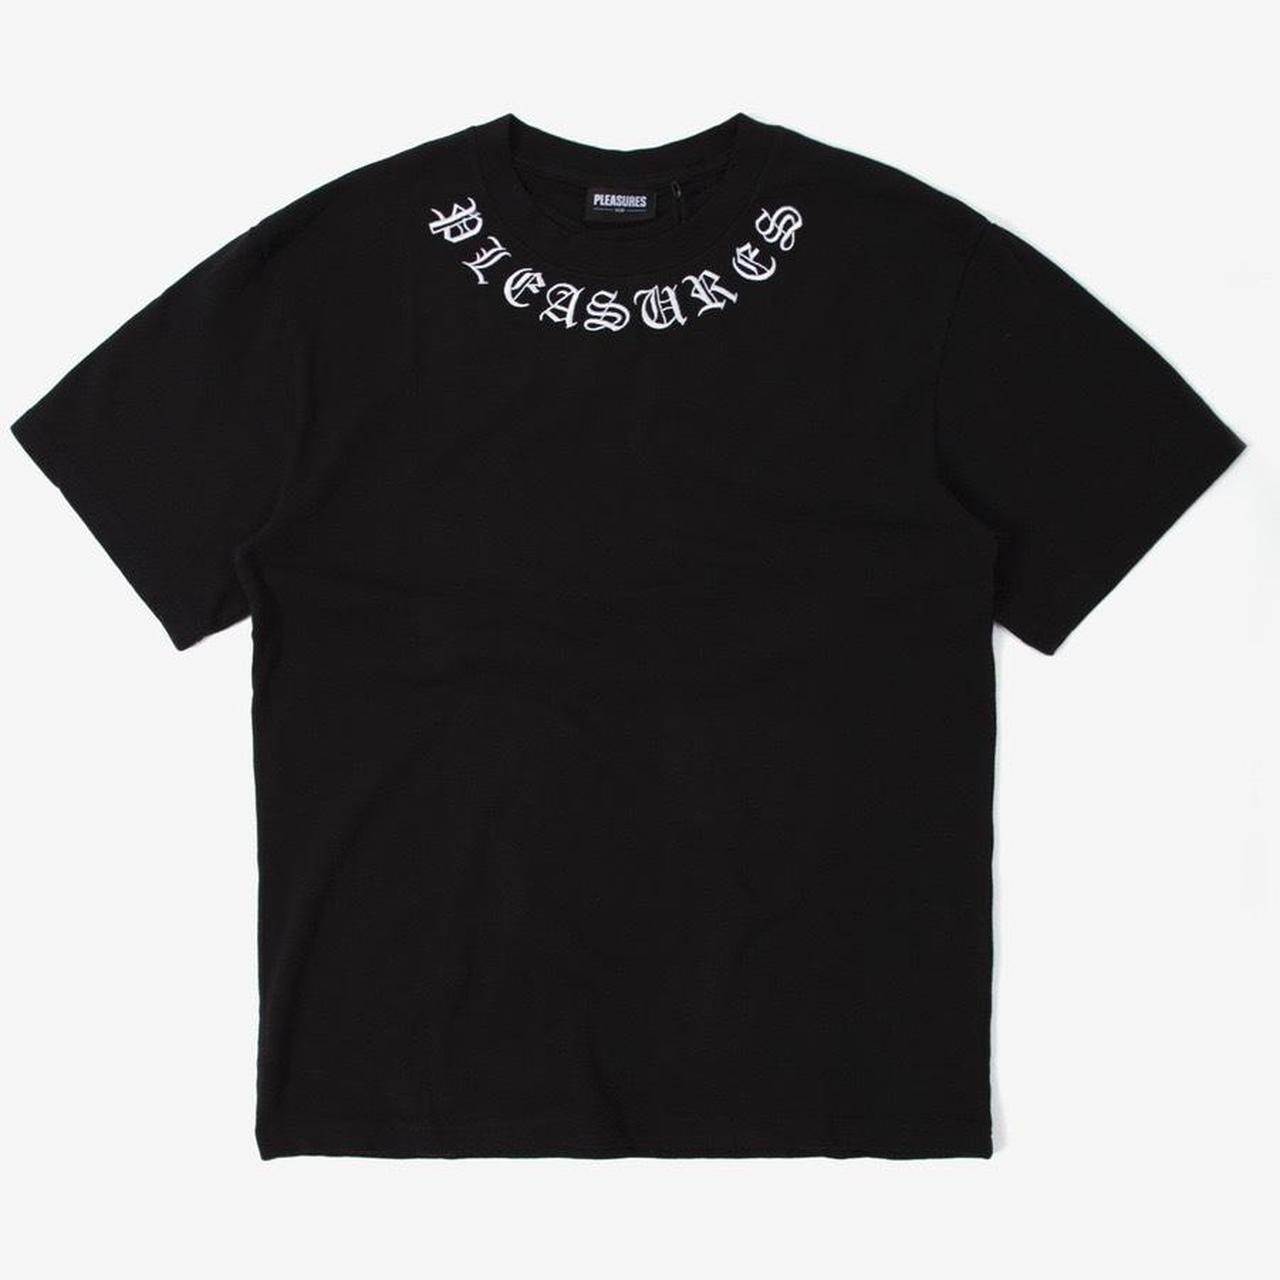 Product Image 1 - pleasures olde english shirt. NWT.